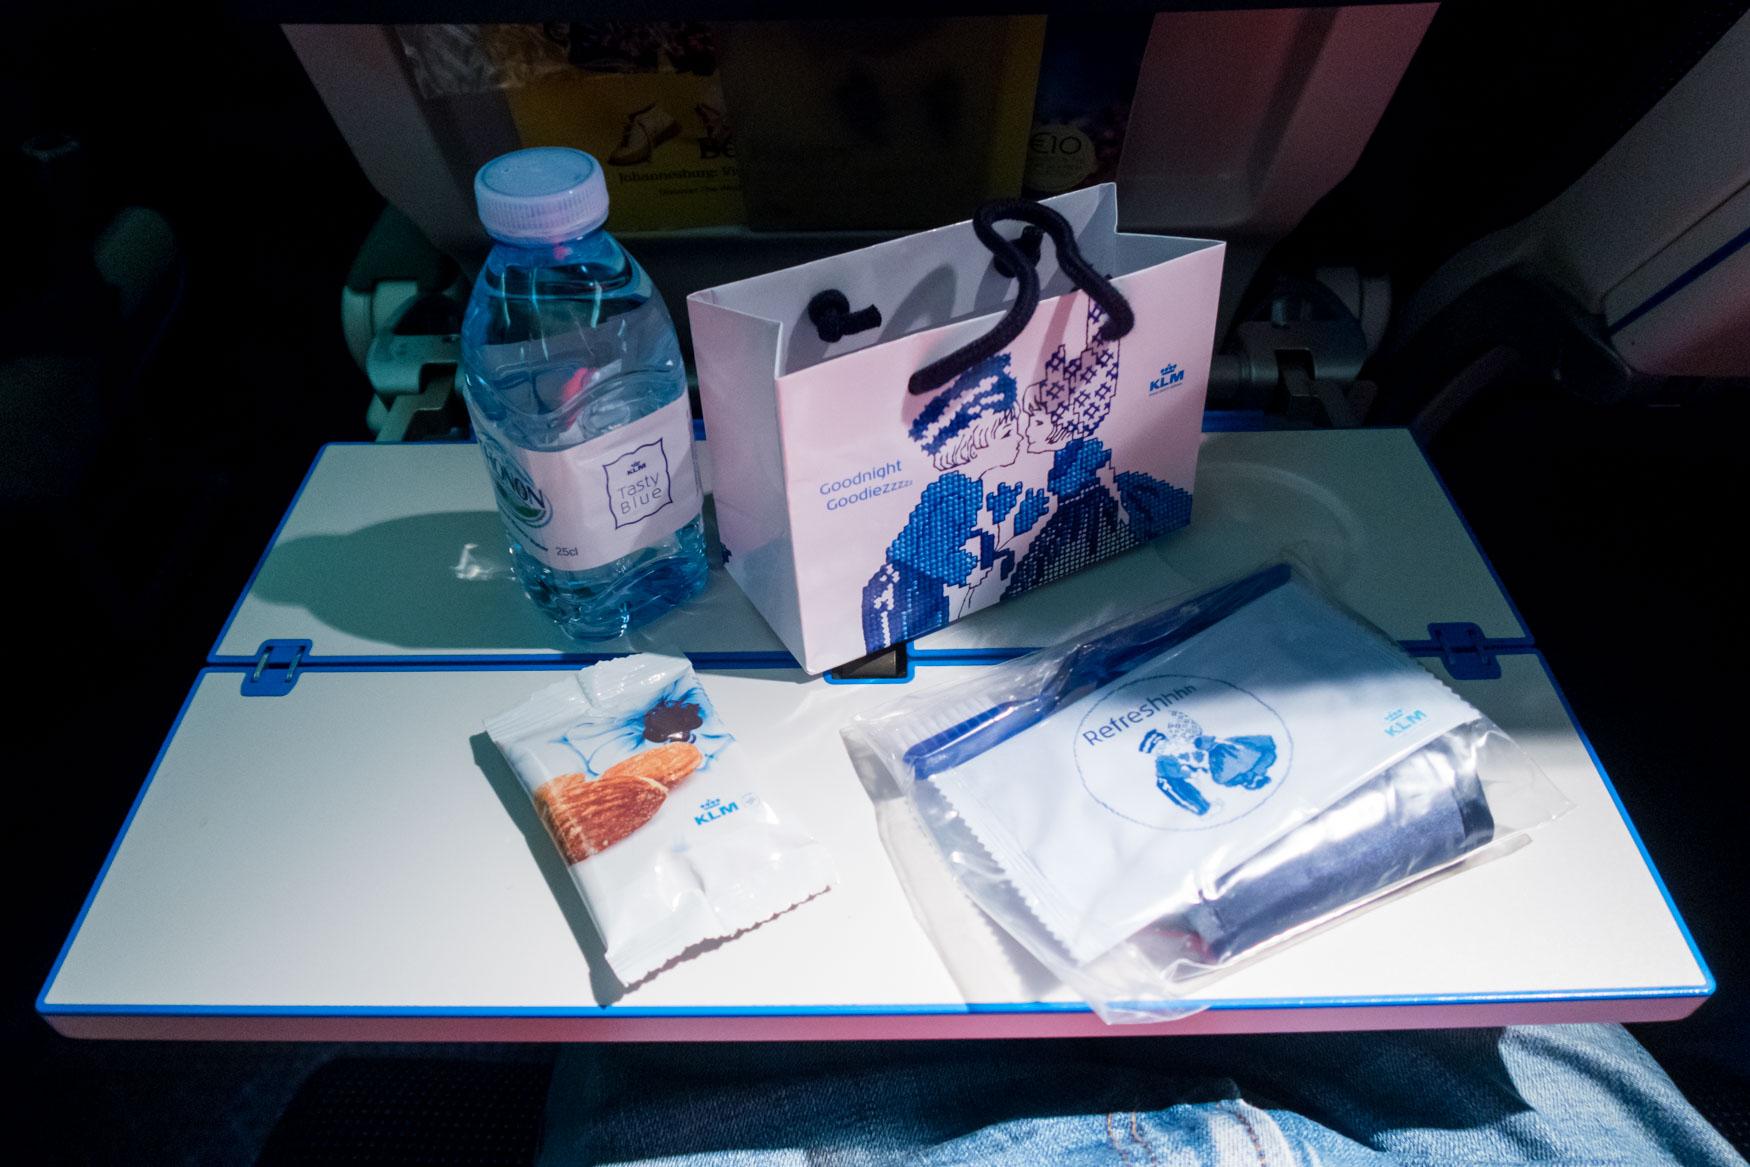 KLM Amenity Kit